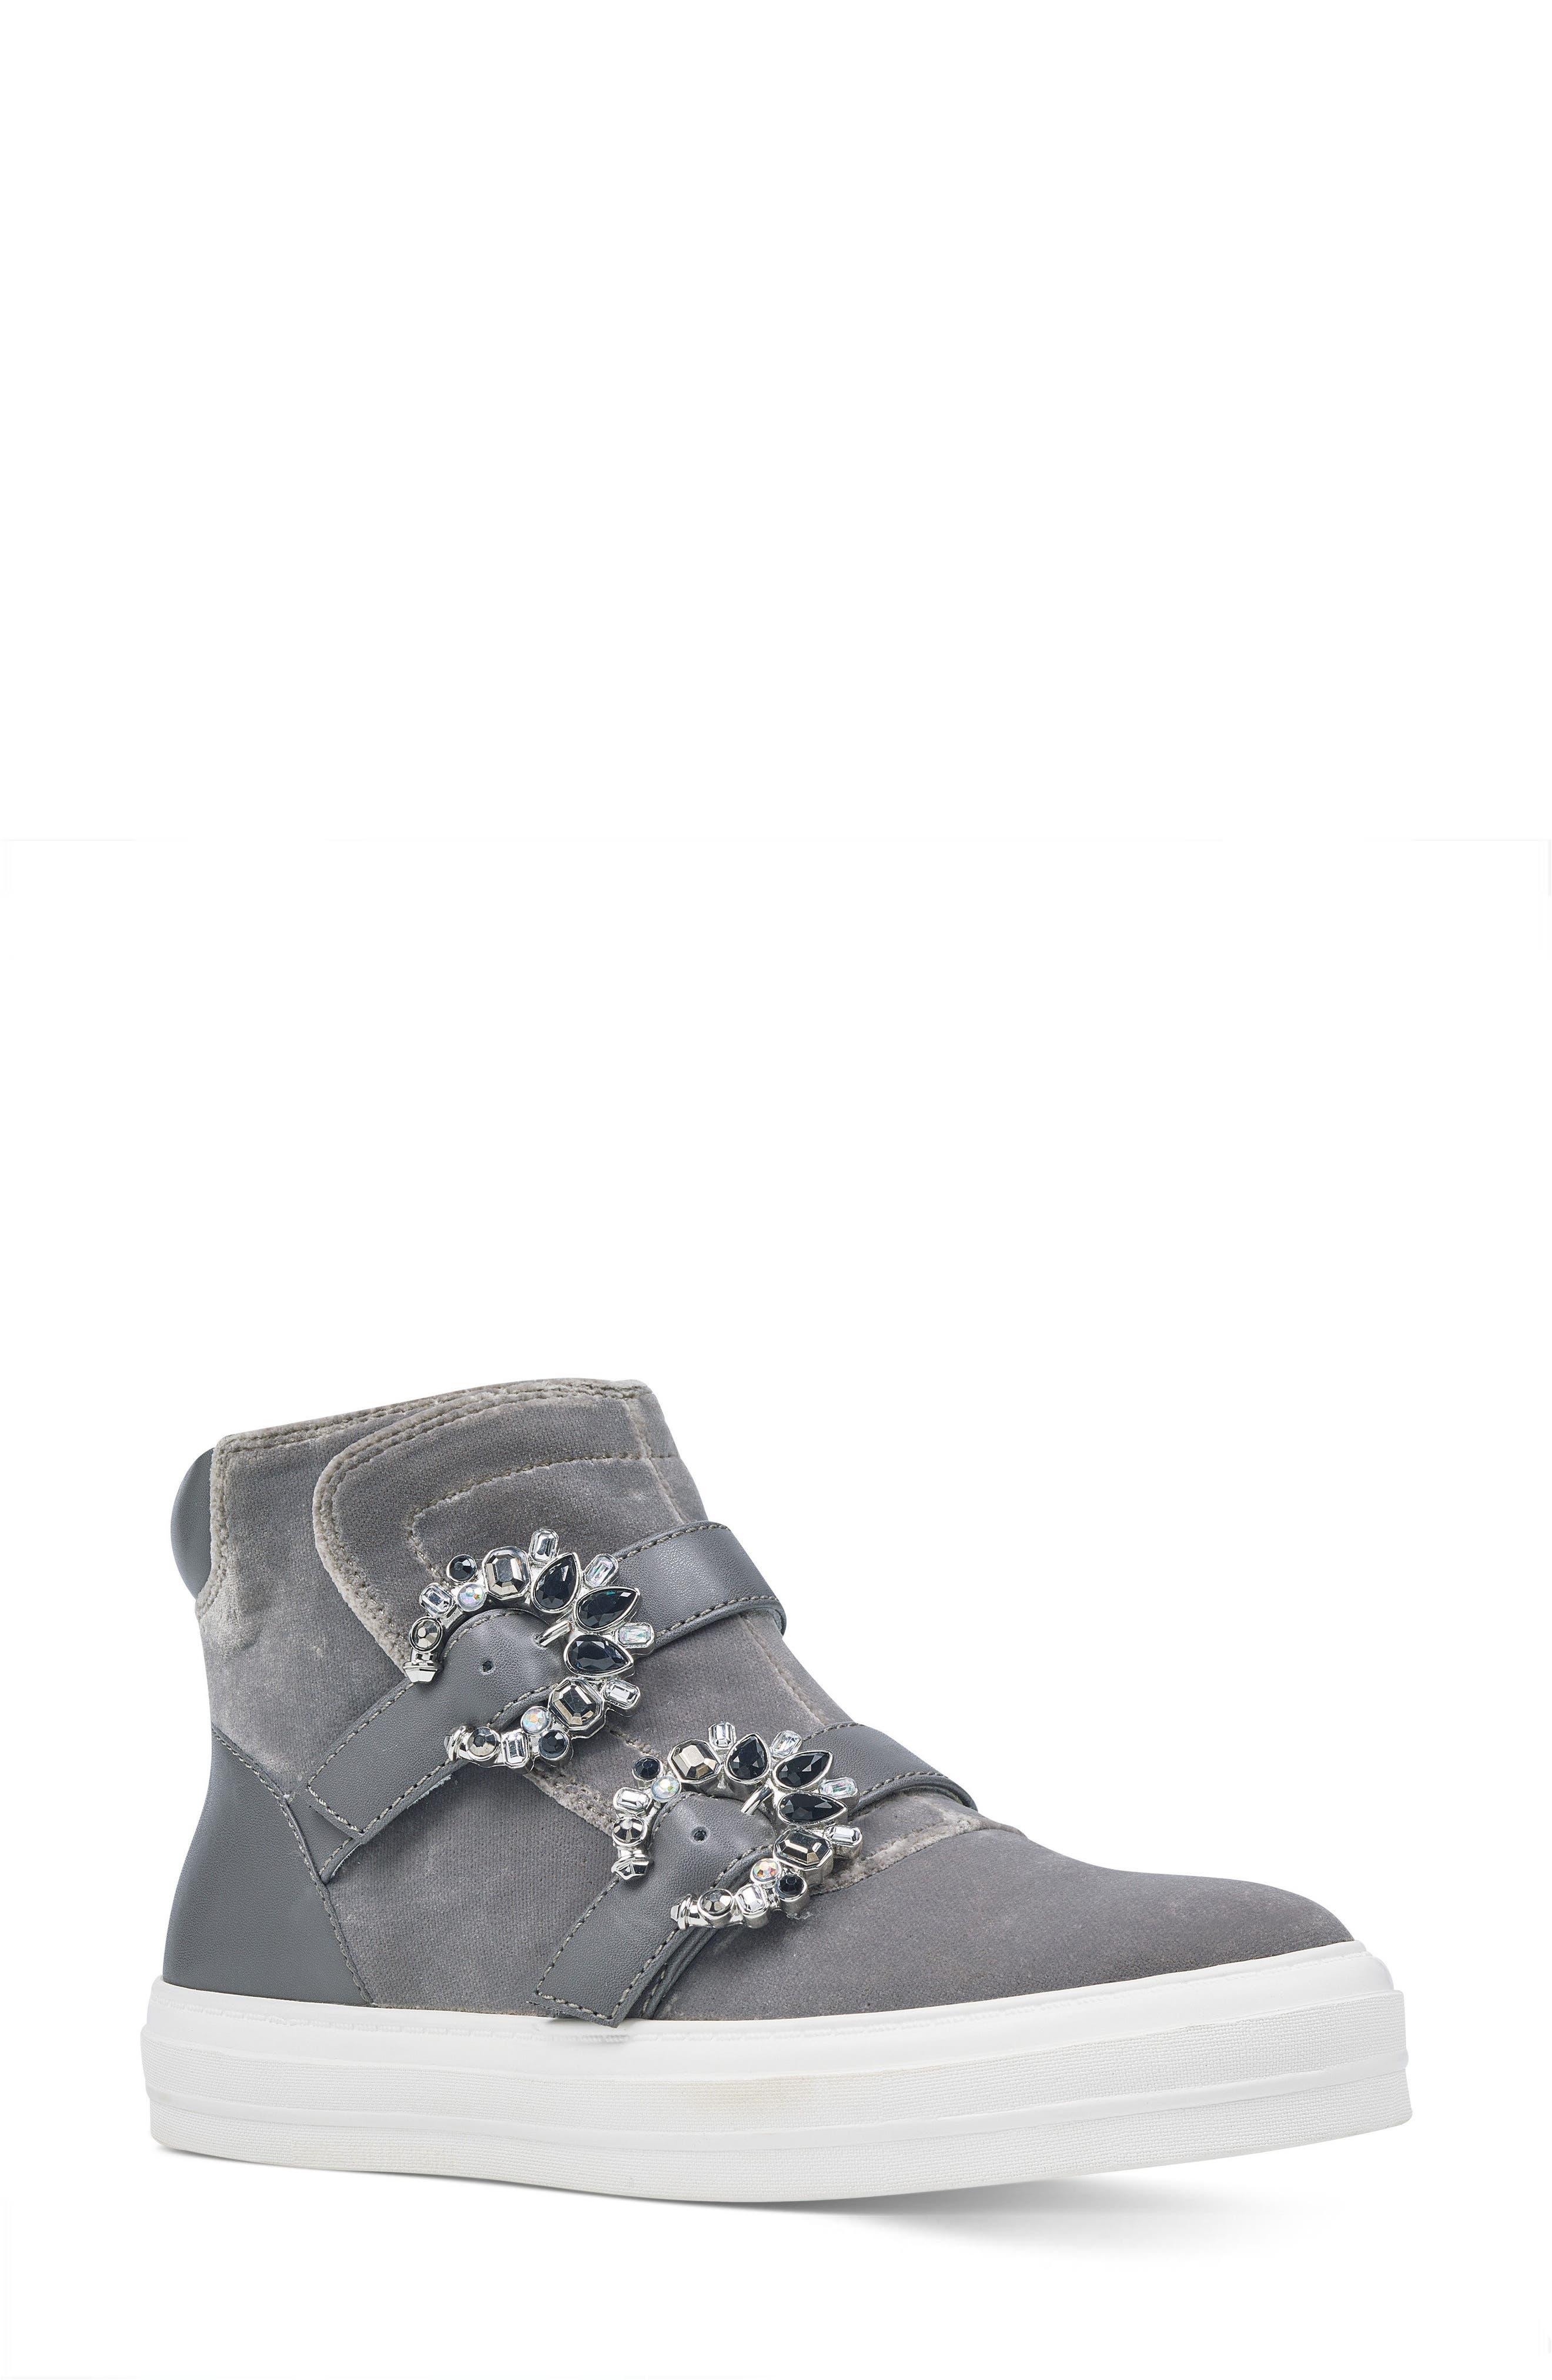 Main Image - Nine West Orisna High Top Sneaker (Women)